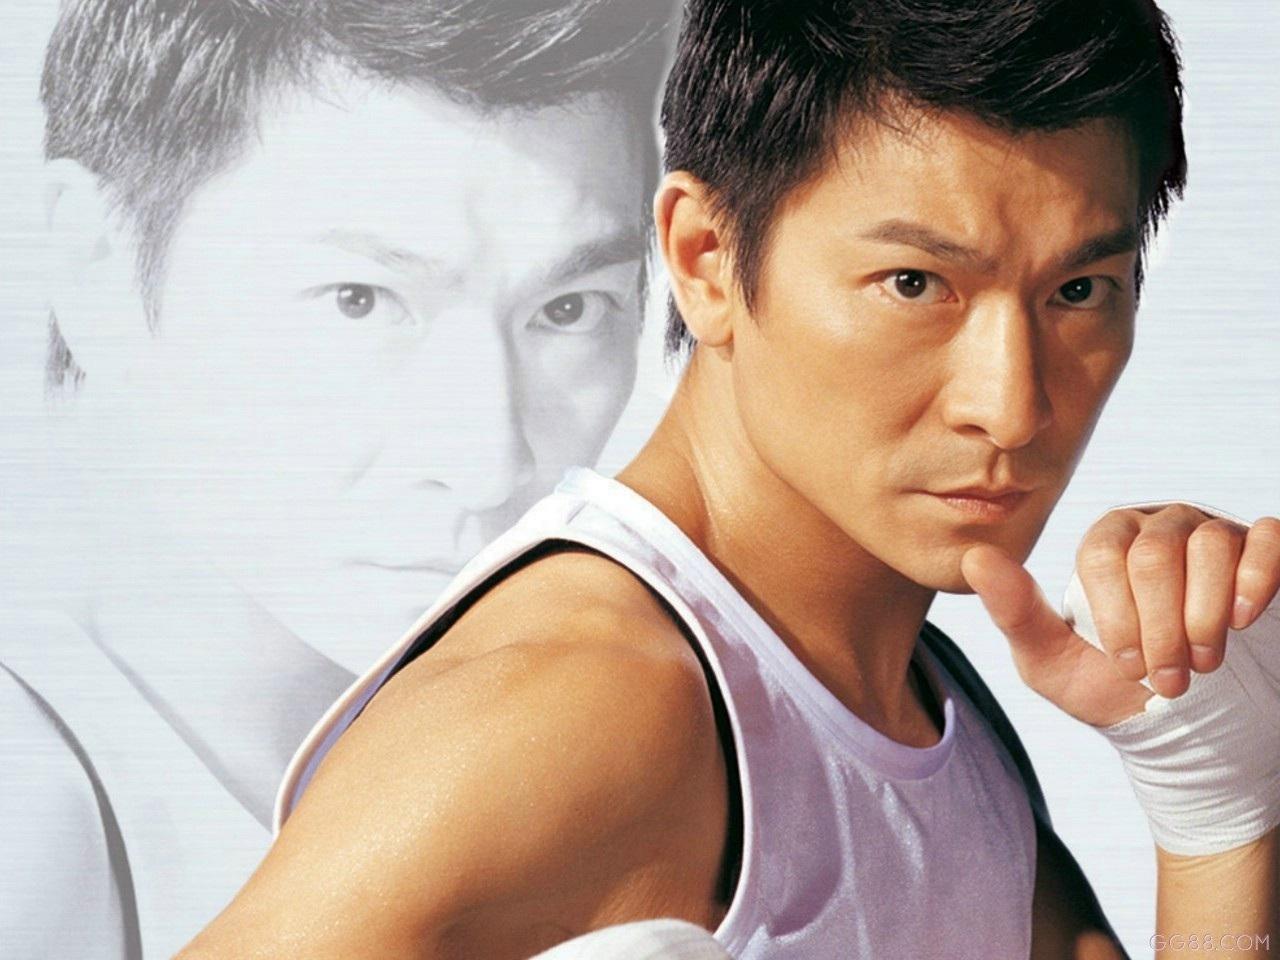 Andy Lau Wallpaper Top Wallpapers 1280x960